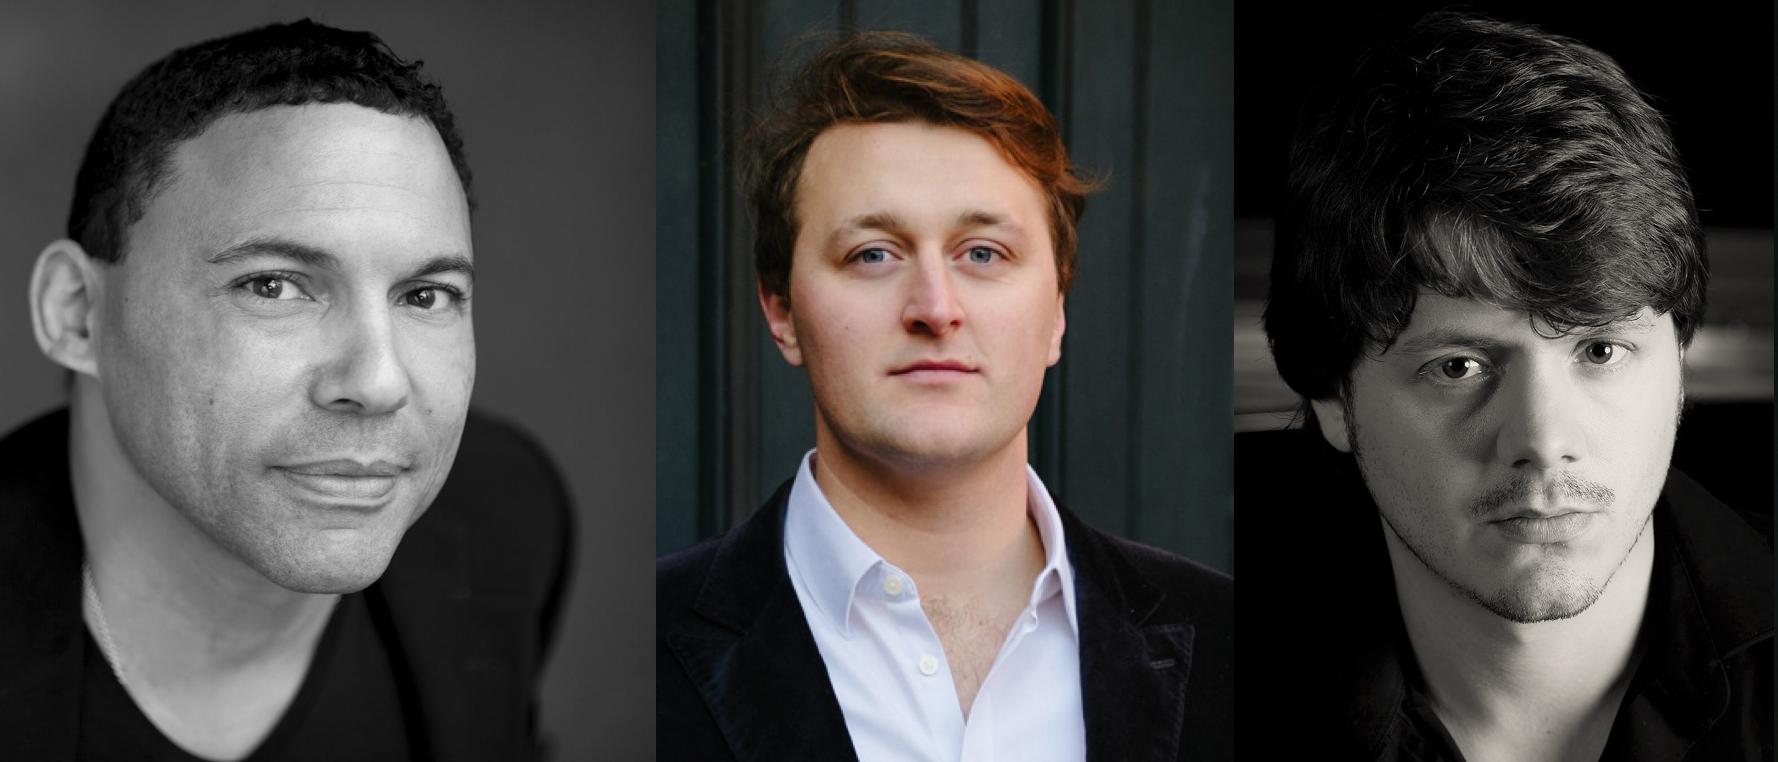 From Left to Right: Tom Randle (Leonardo), Feargal Mostyn-Williams (counter-tenor), and Richard Immerglück (Melzi).